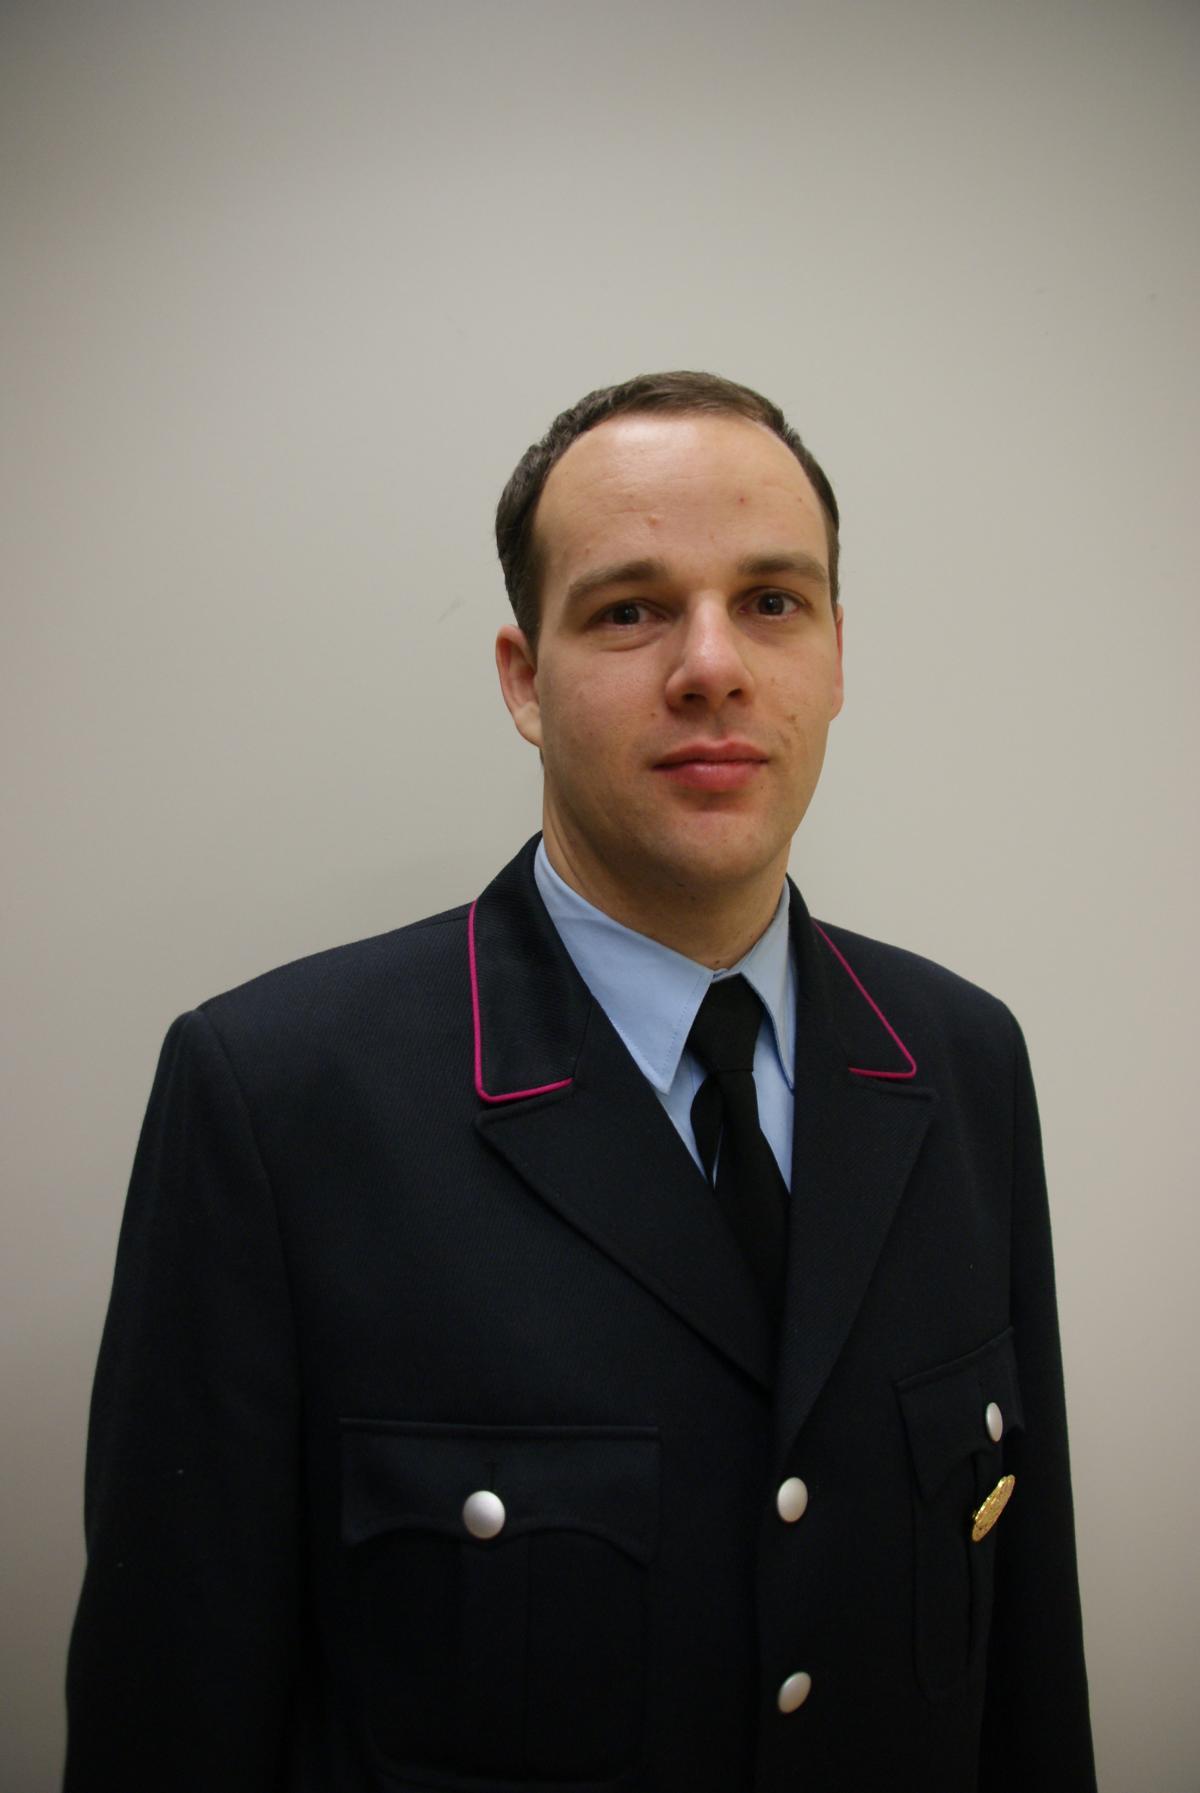 Michael Bietz